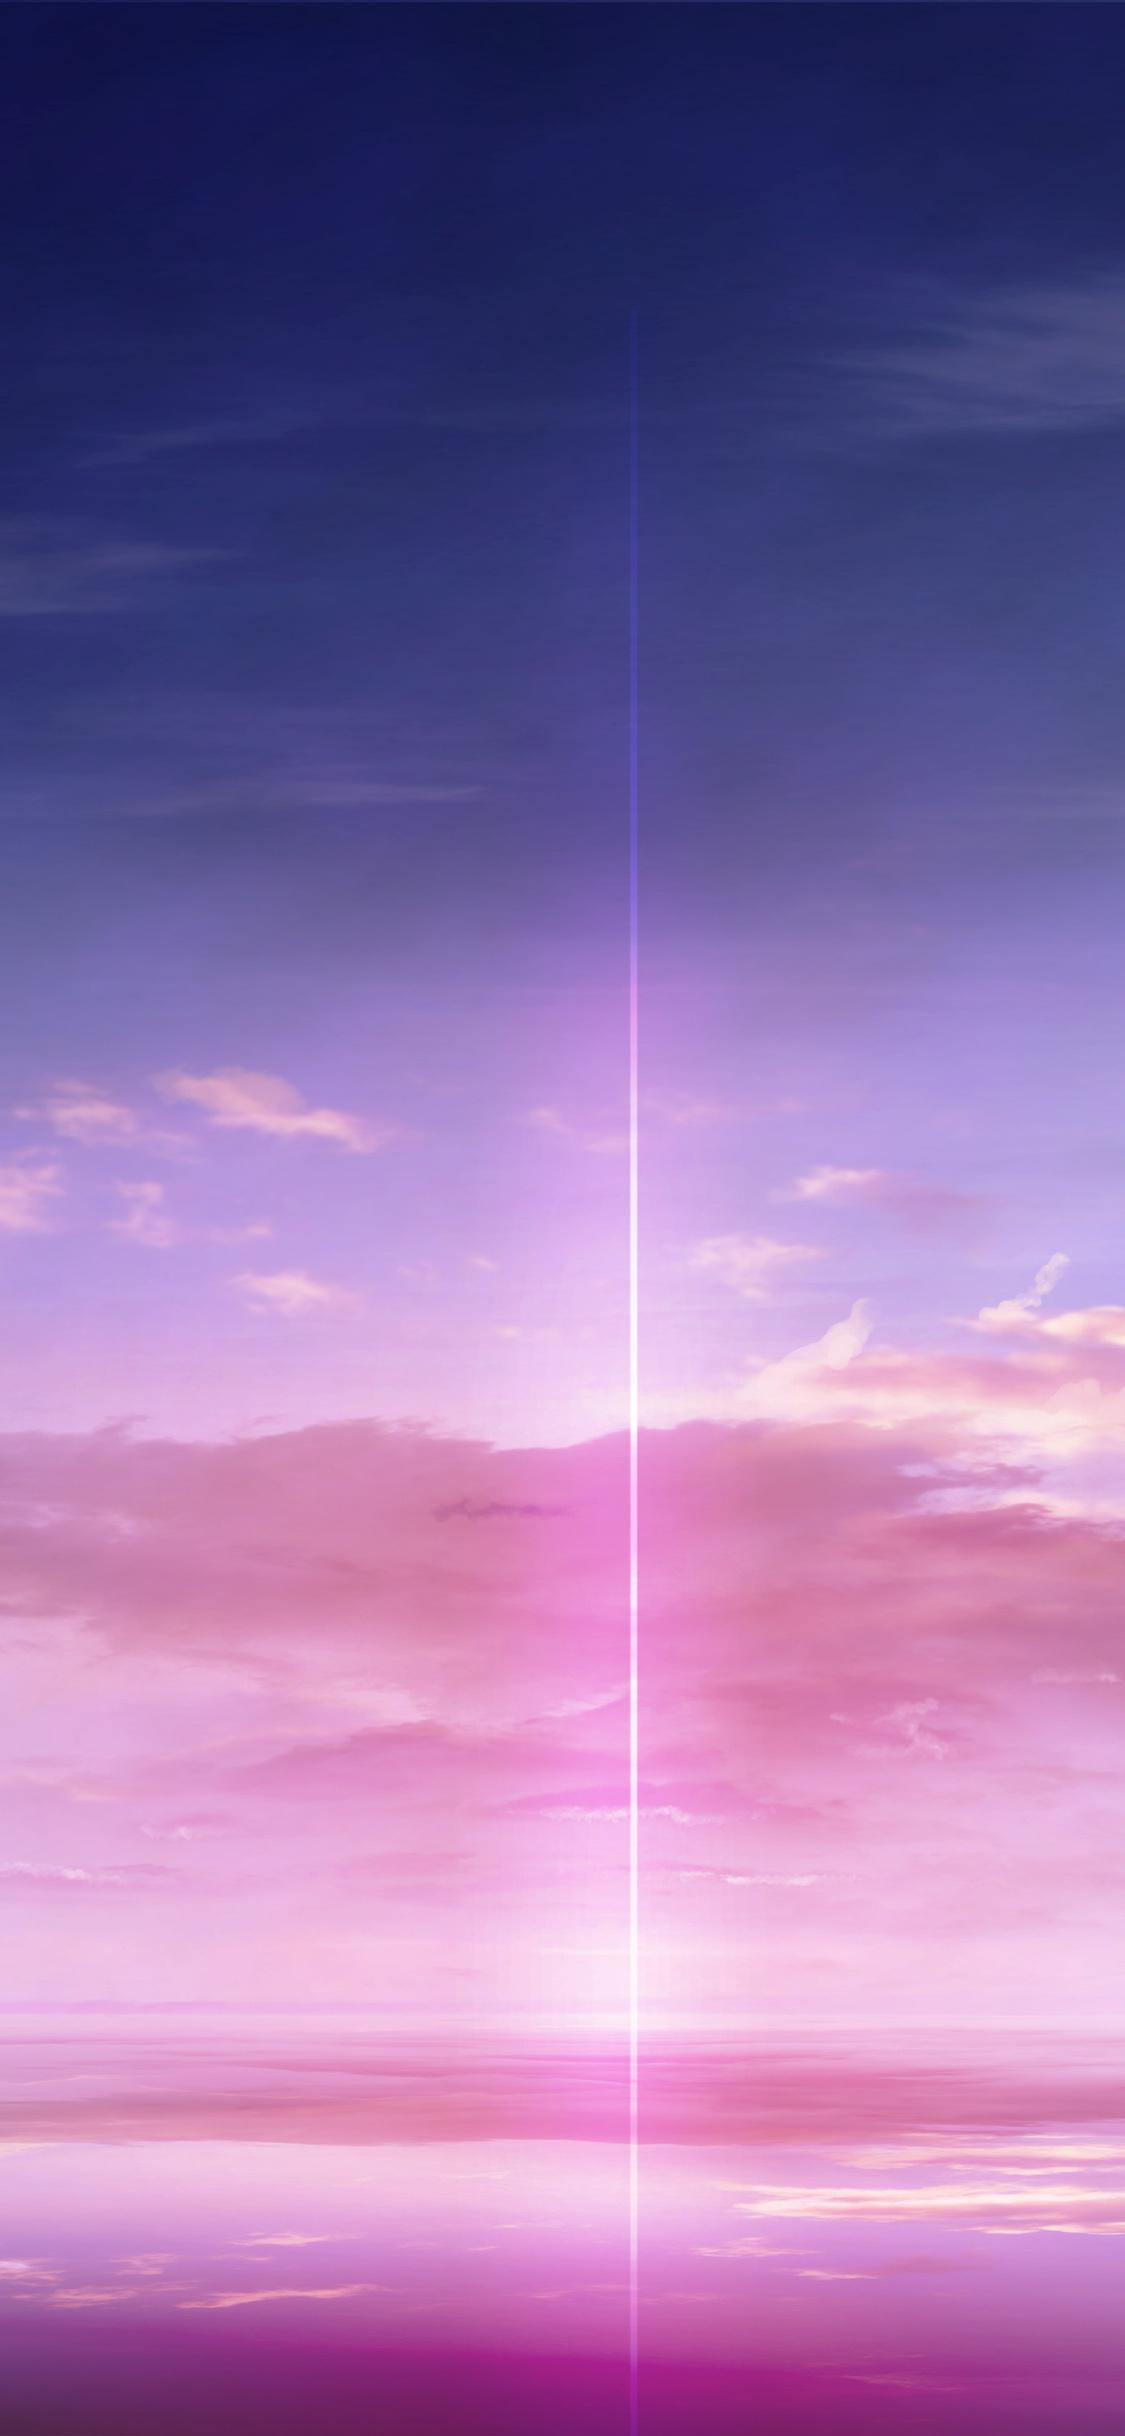 1125x2436 Anime Original 8k Iphone XS,Iphone 10,Iphone X ...